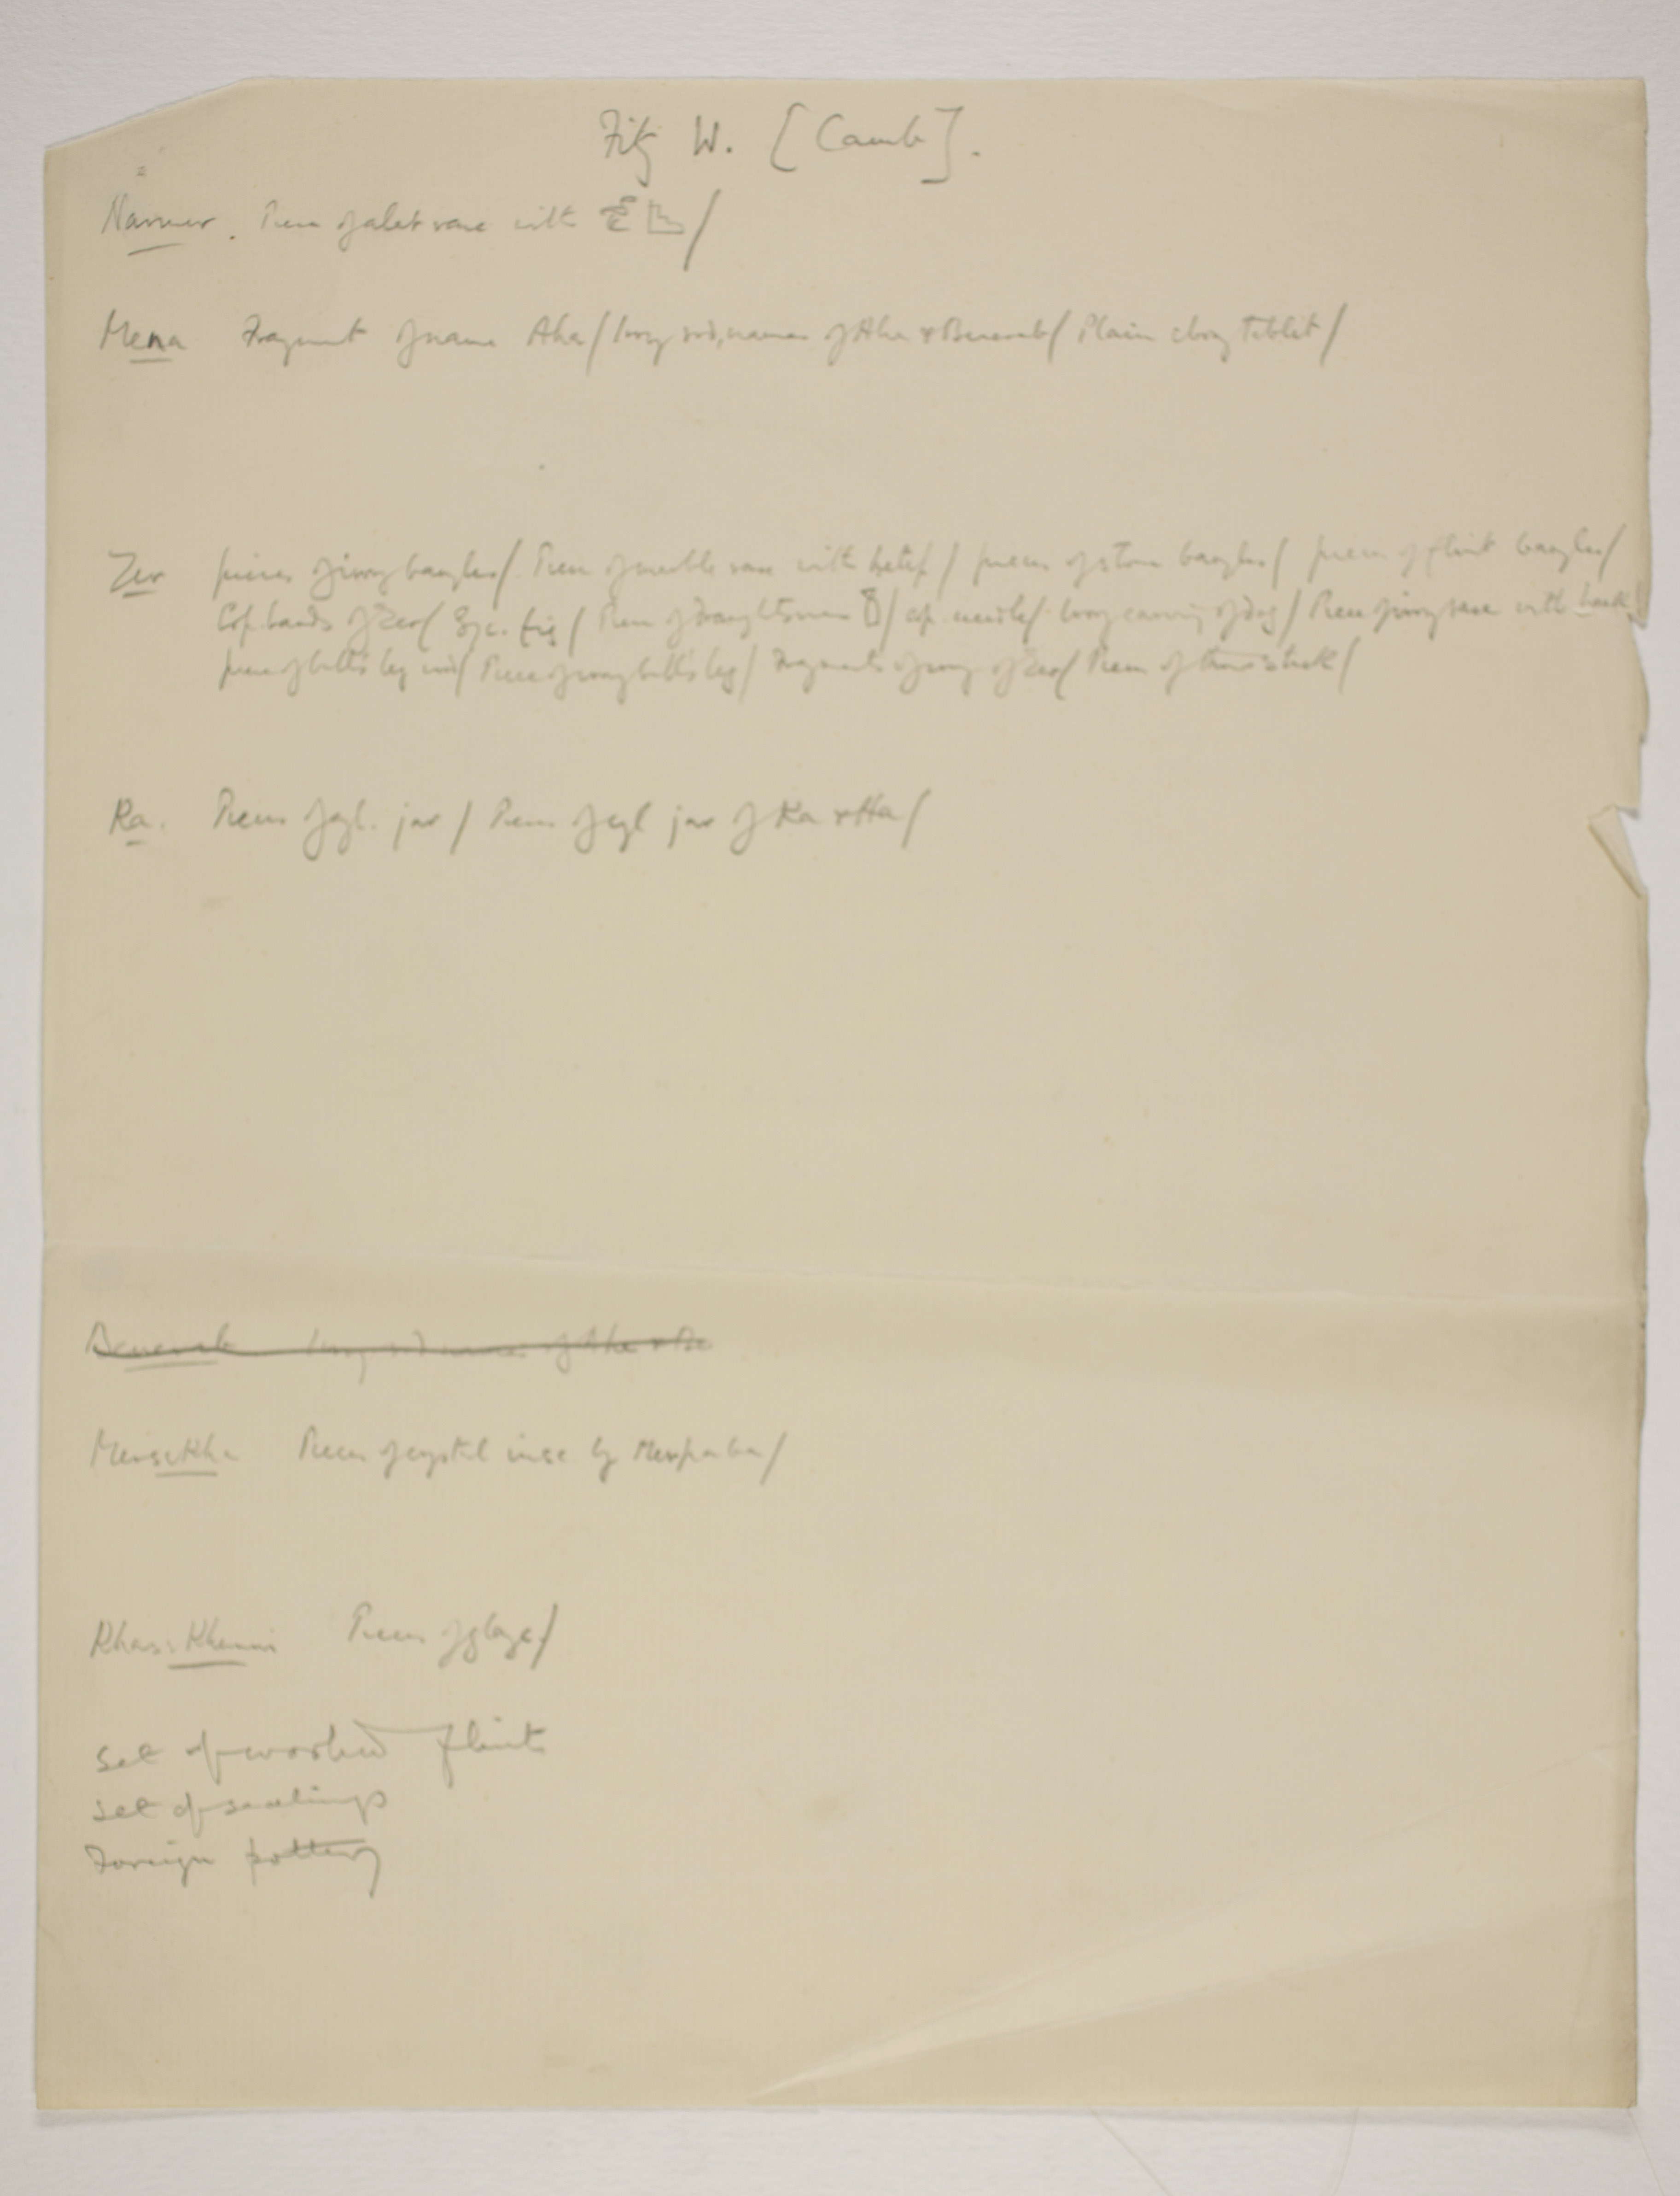 1900-01 Abydos, Bet Khallaf, el-Mahasna Individual institution list  PMA/WFP1/D/9/14